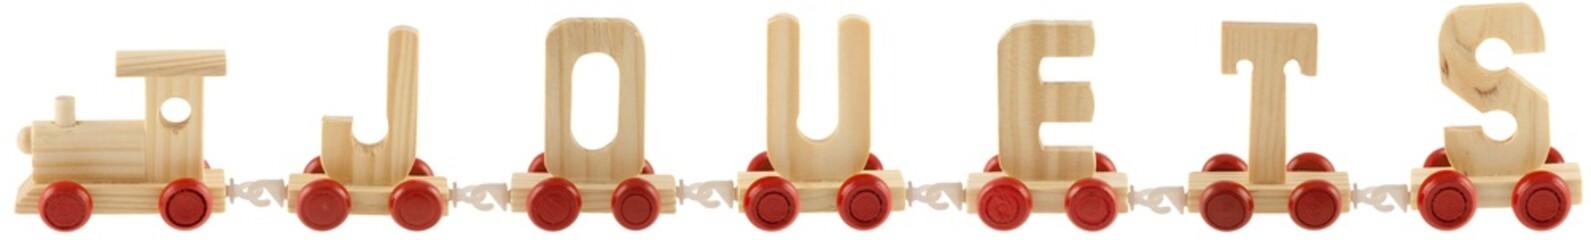 train jouets, fond blanc